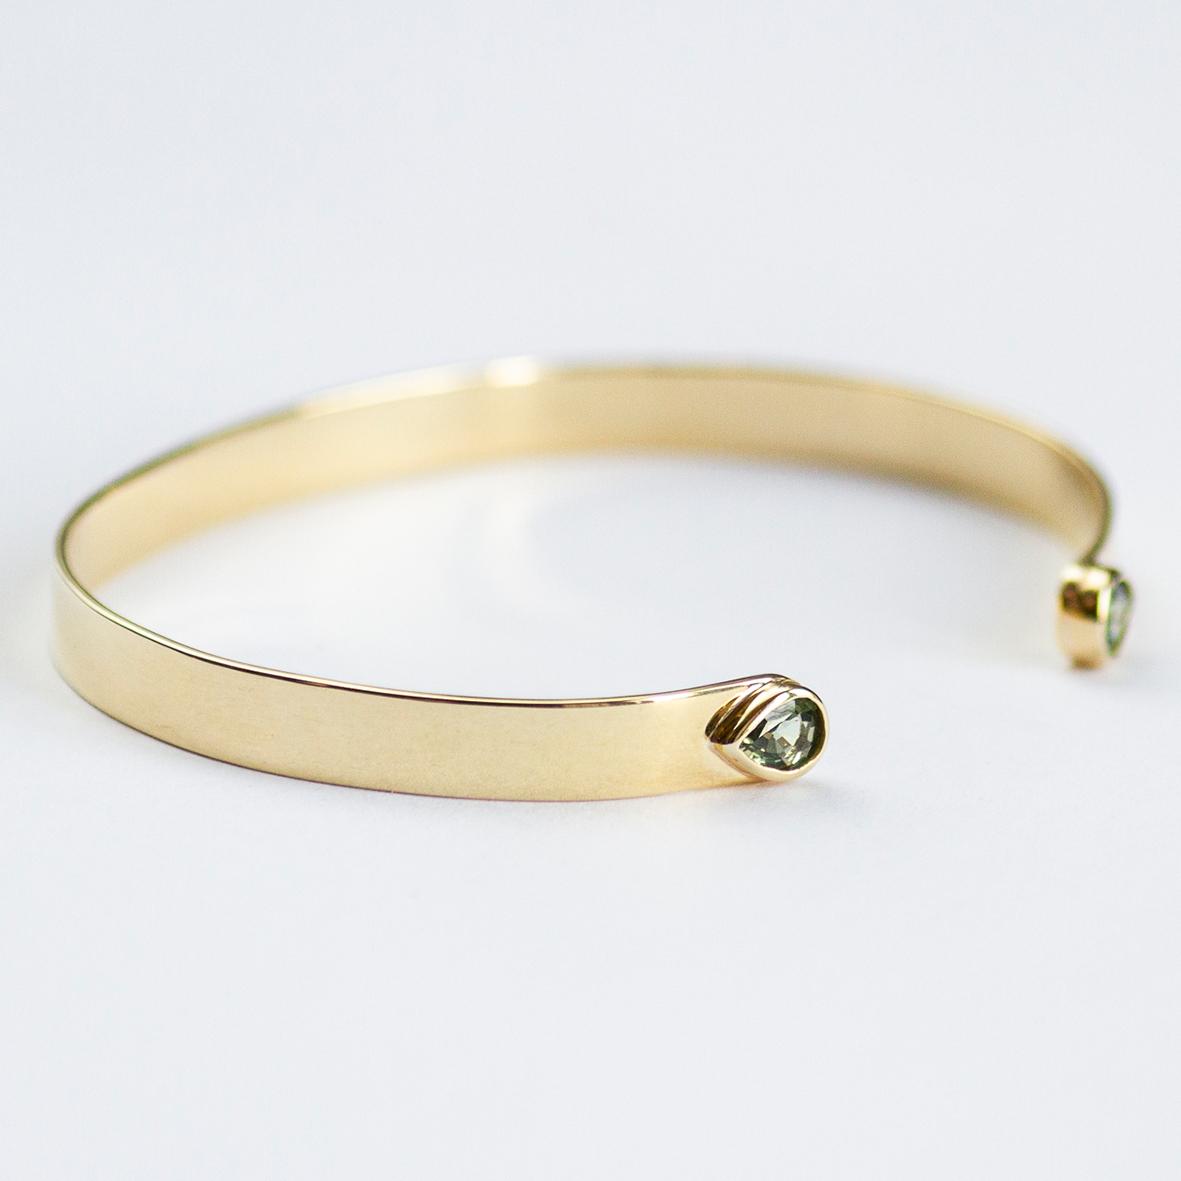 3. OONA_lotus_ficha2_flat sapphire bracelet